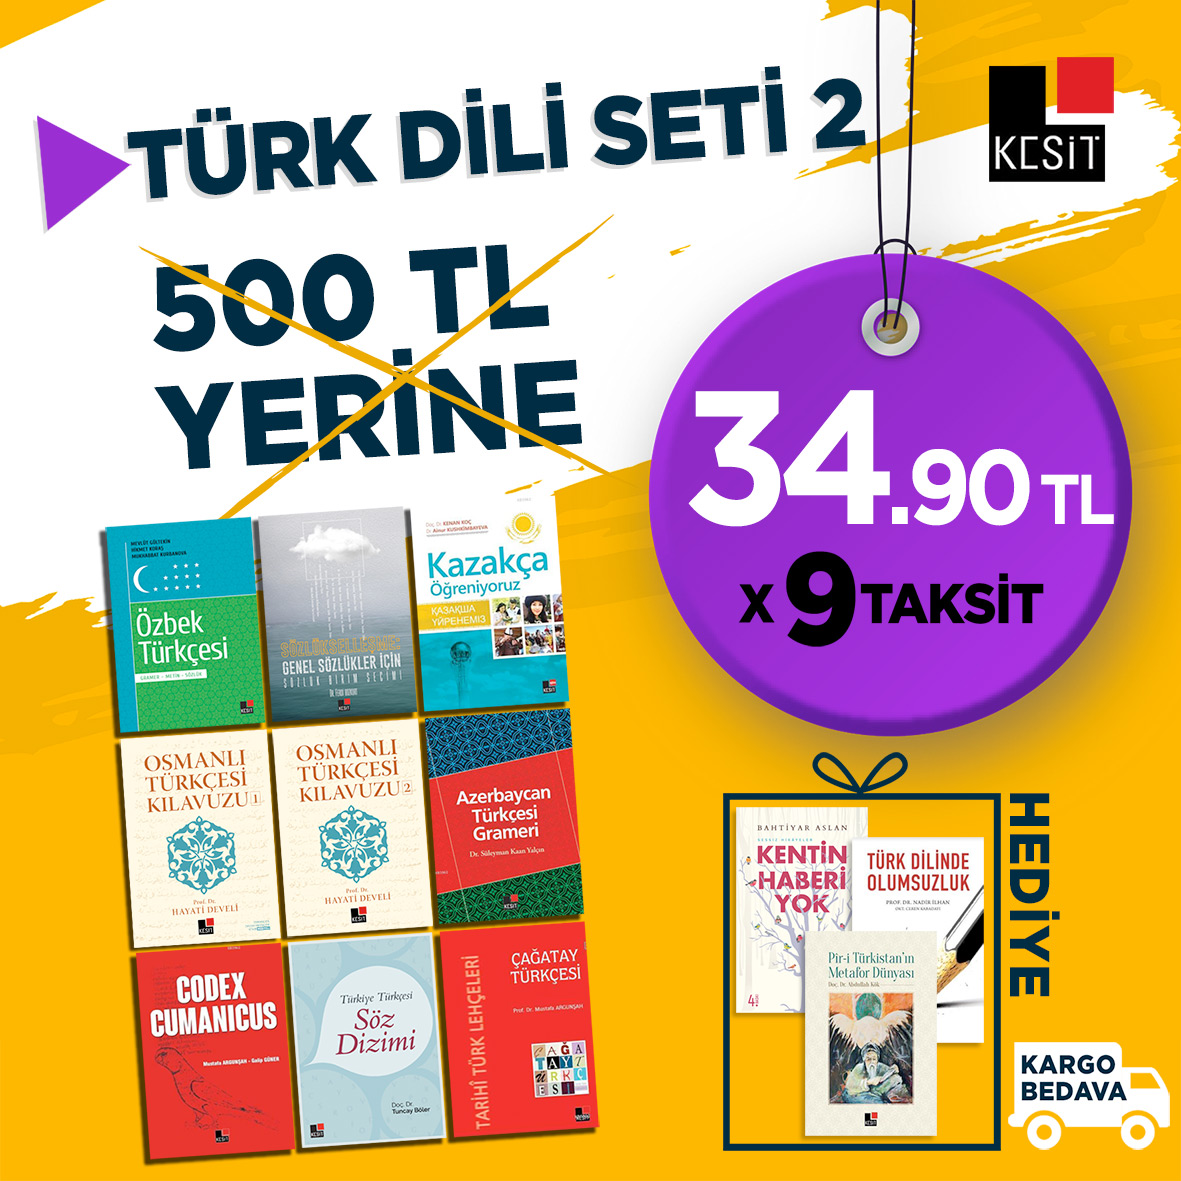 Türk Dili Seti 2